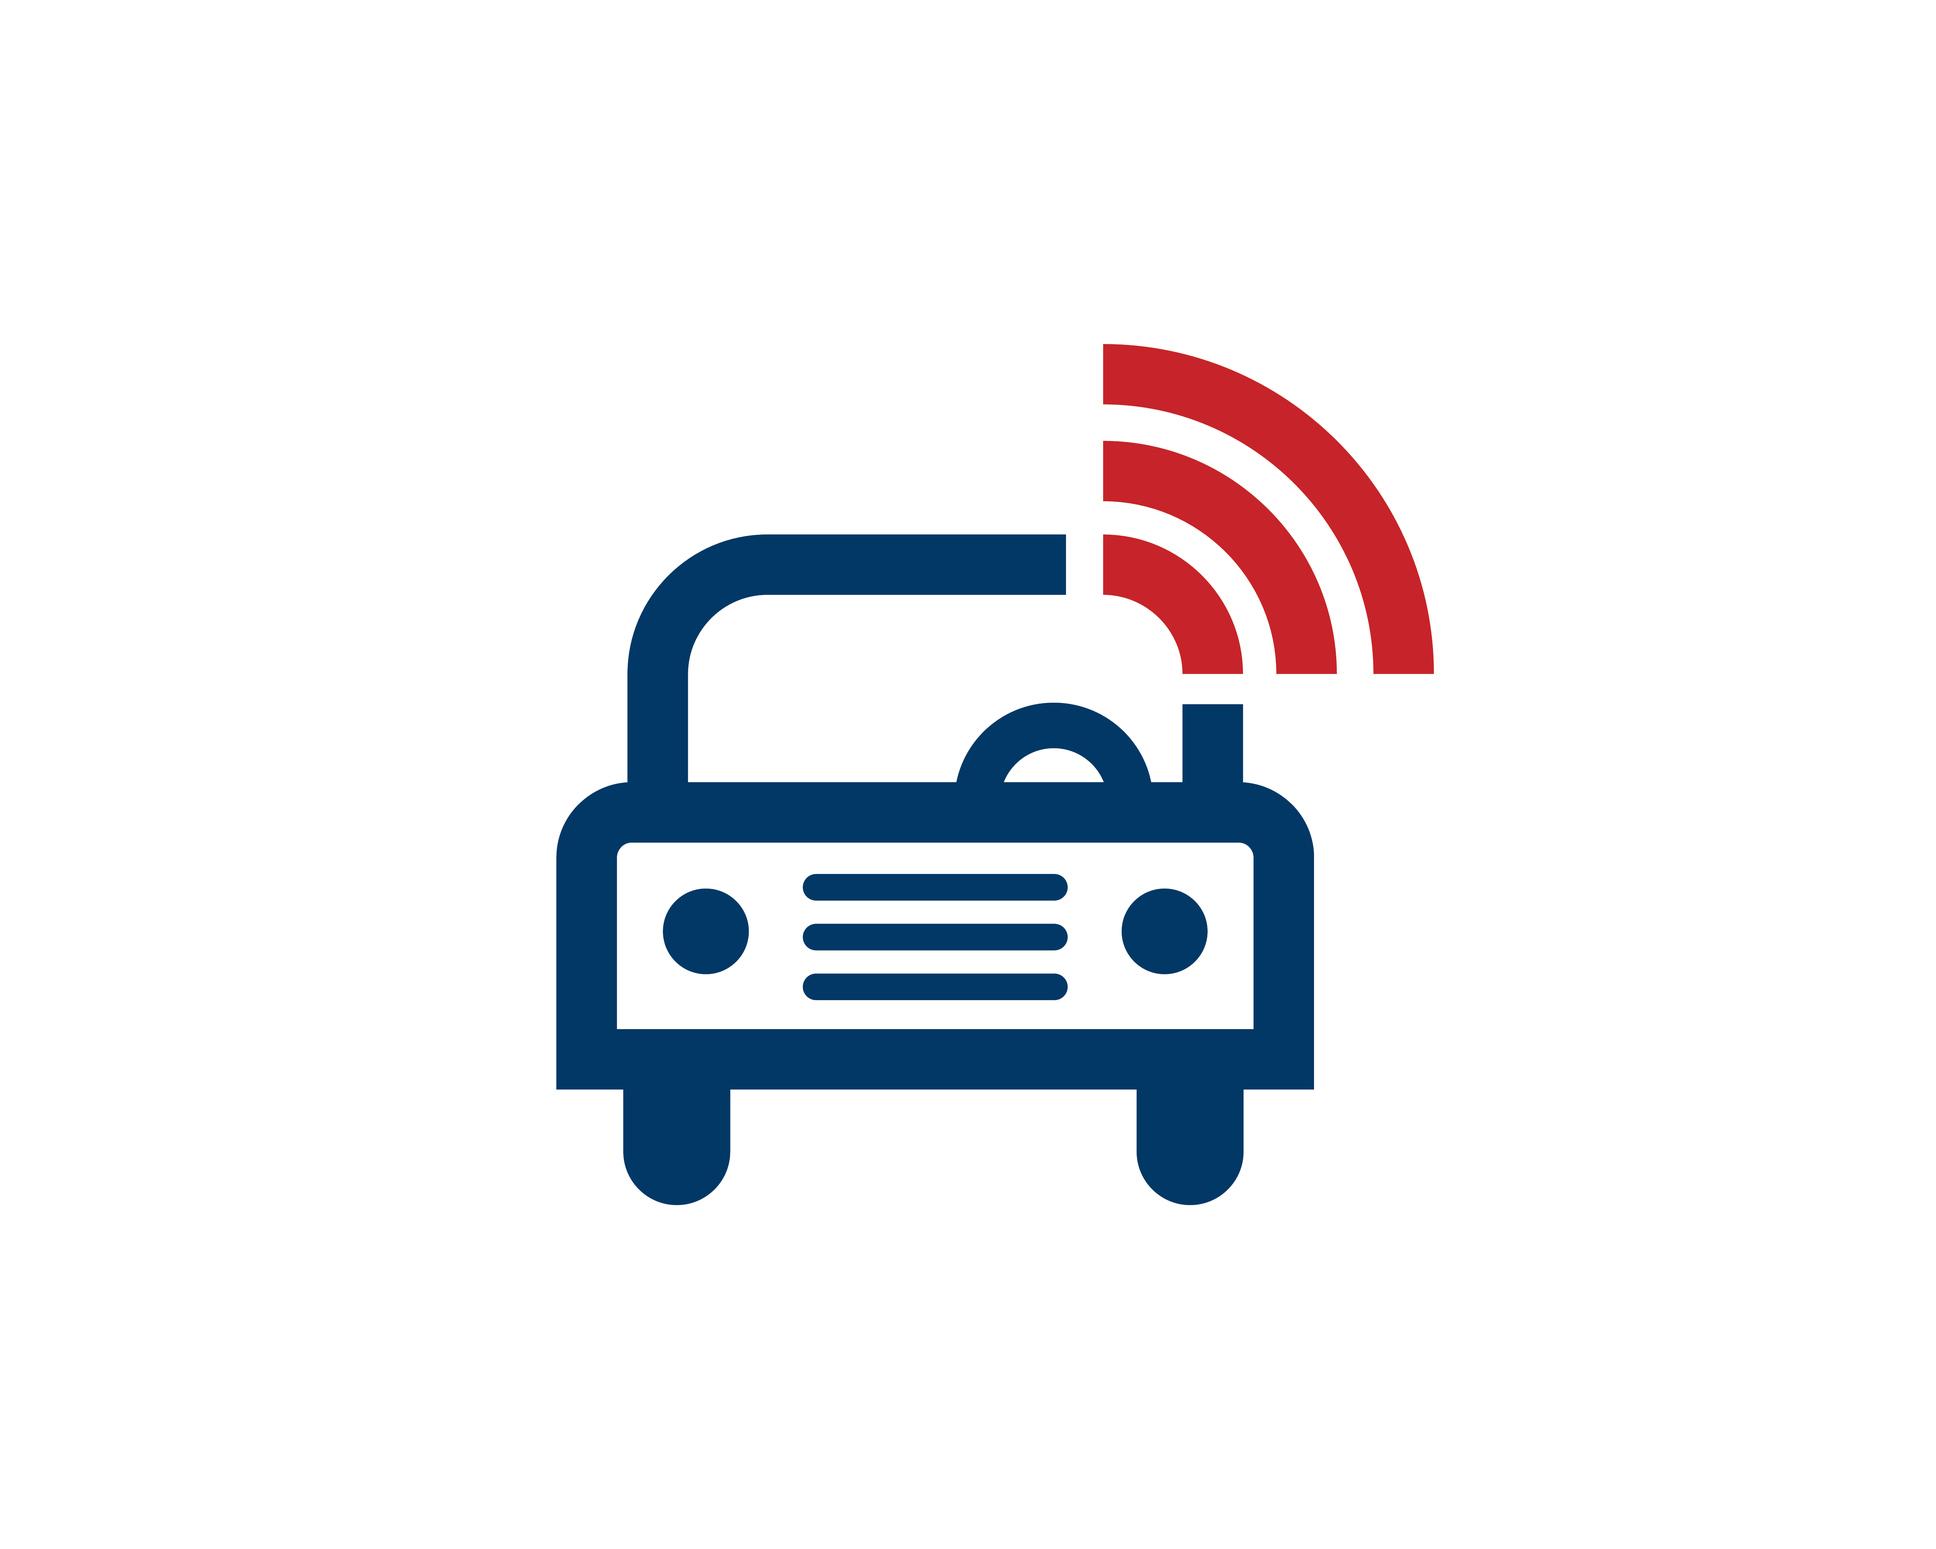 An illustration of a car receiving wireless internet.